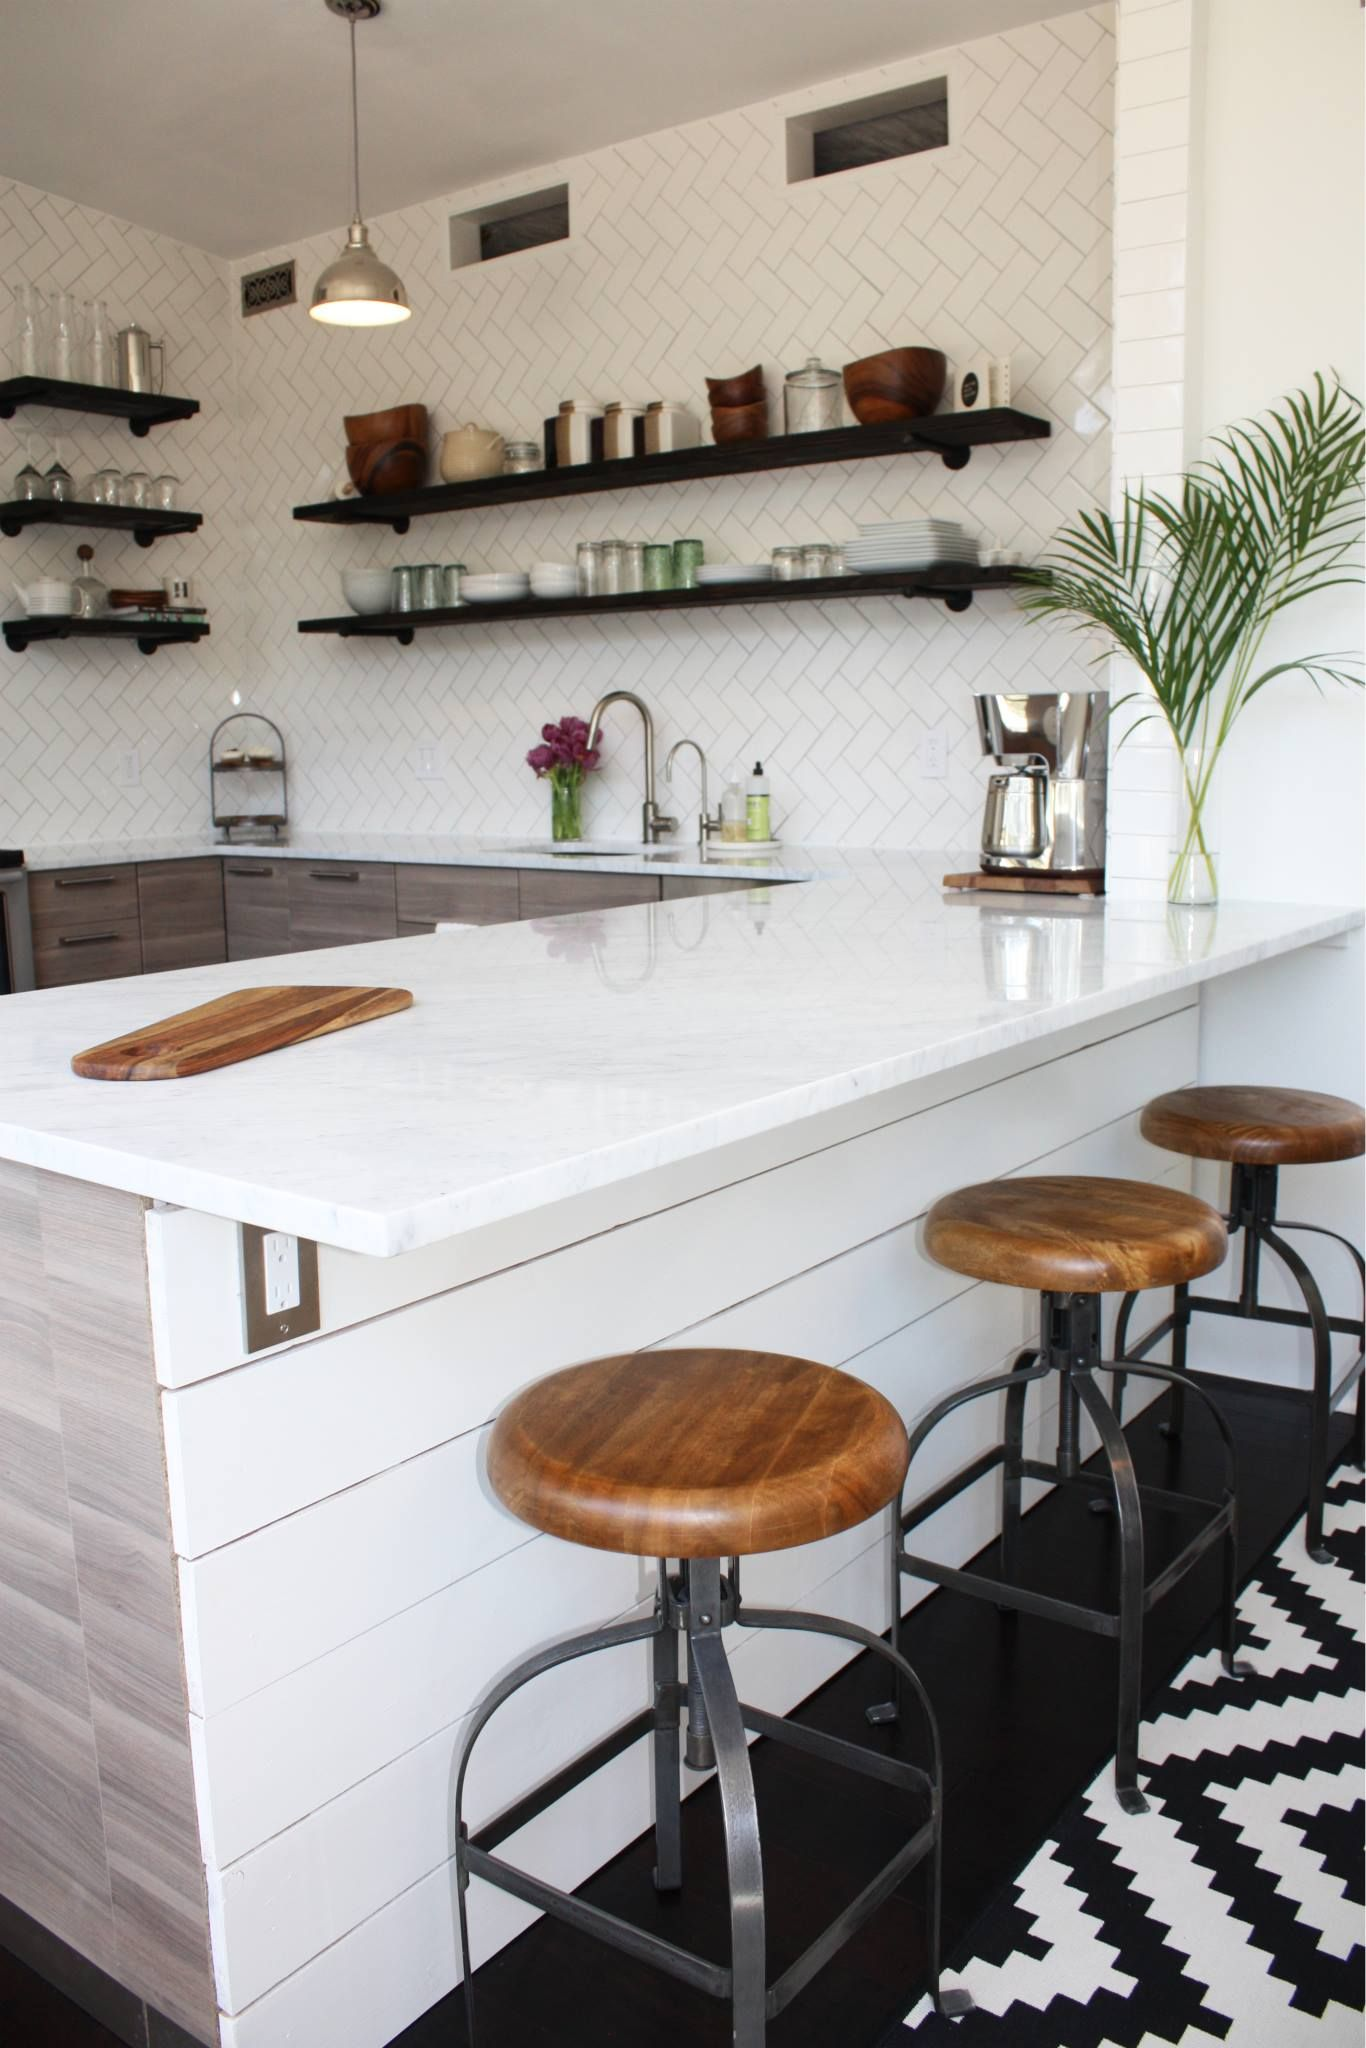 DIY Kitchen Renovation/Remodel, Before and After | Boulder, Co Ikea ...